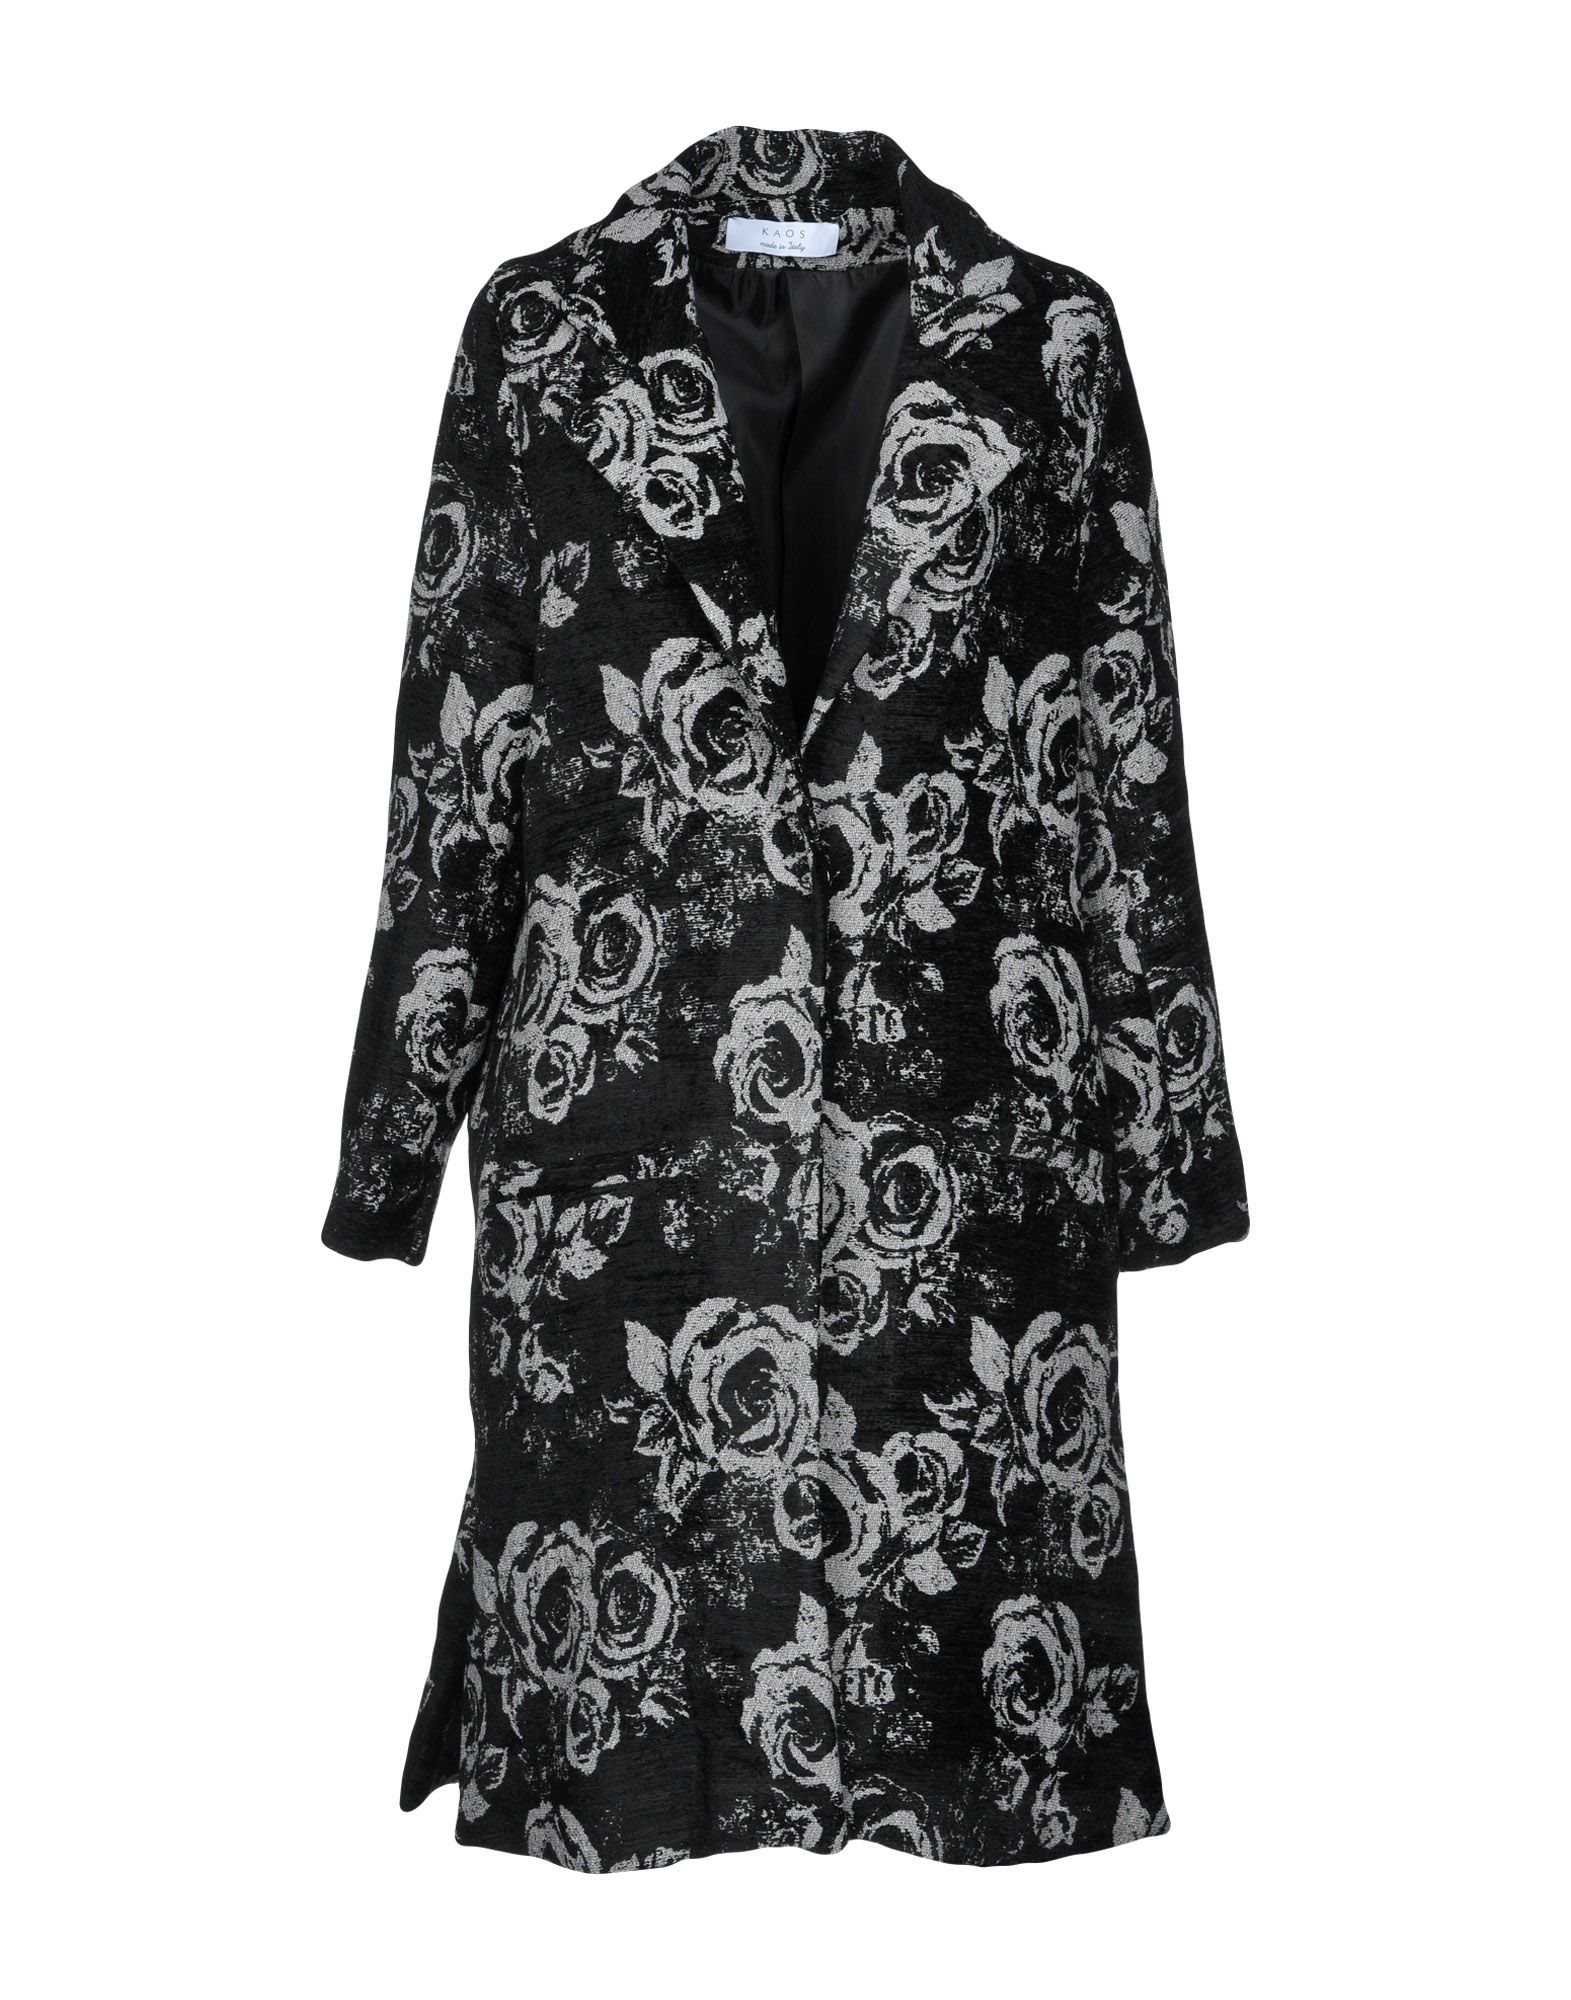 Cappotto Kaos Donna - Acquista online su 7eWQpqp